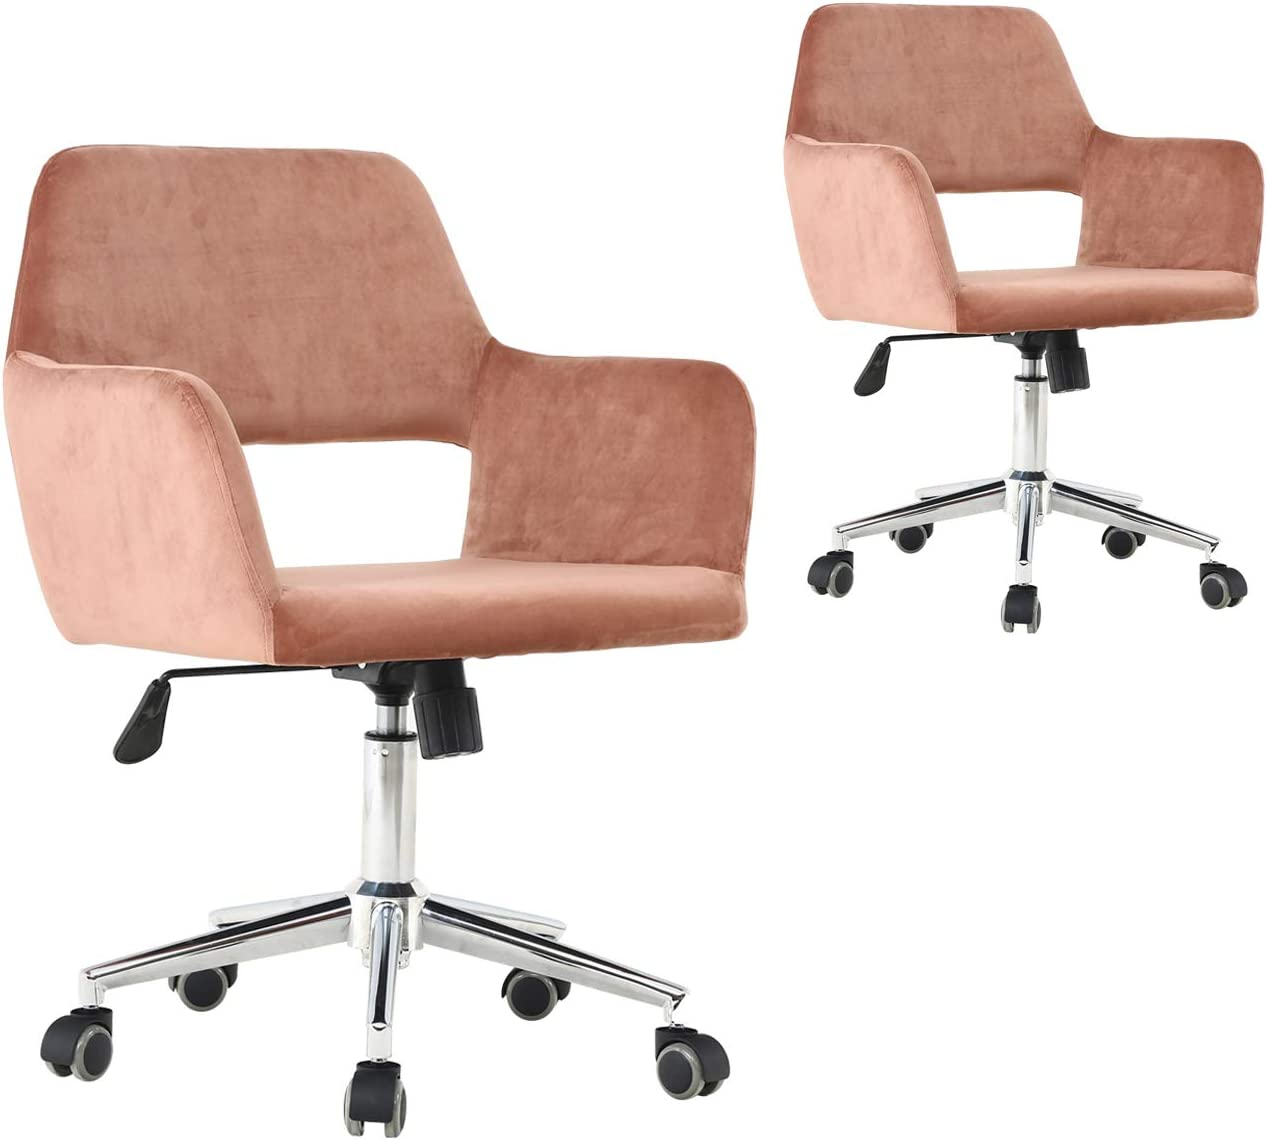 Modern Home Office Desk Chair